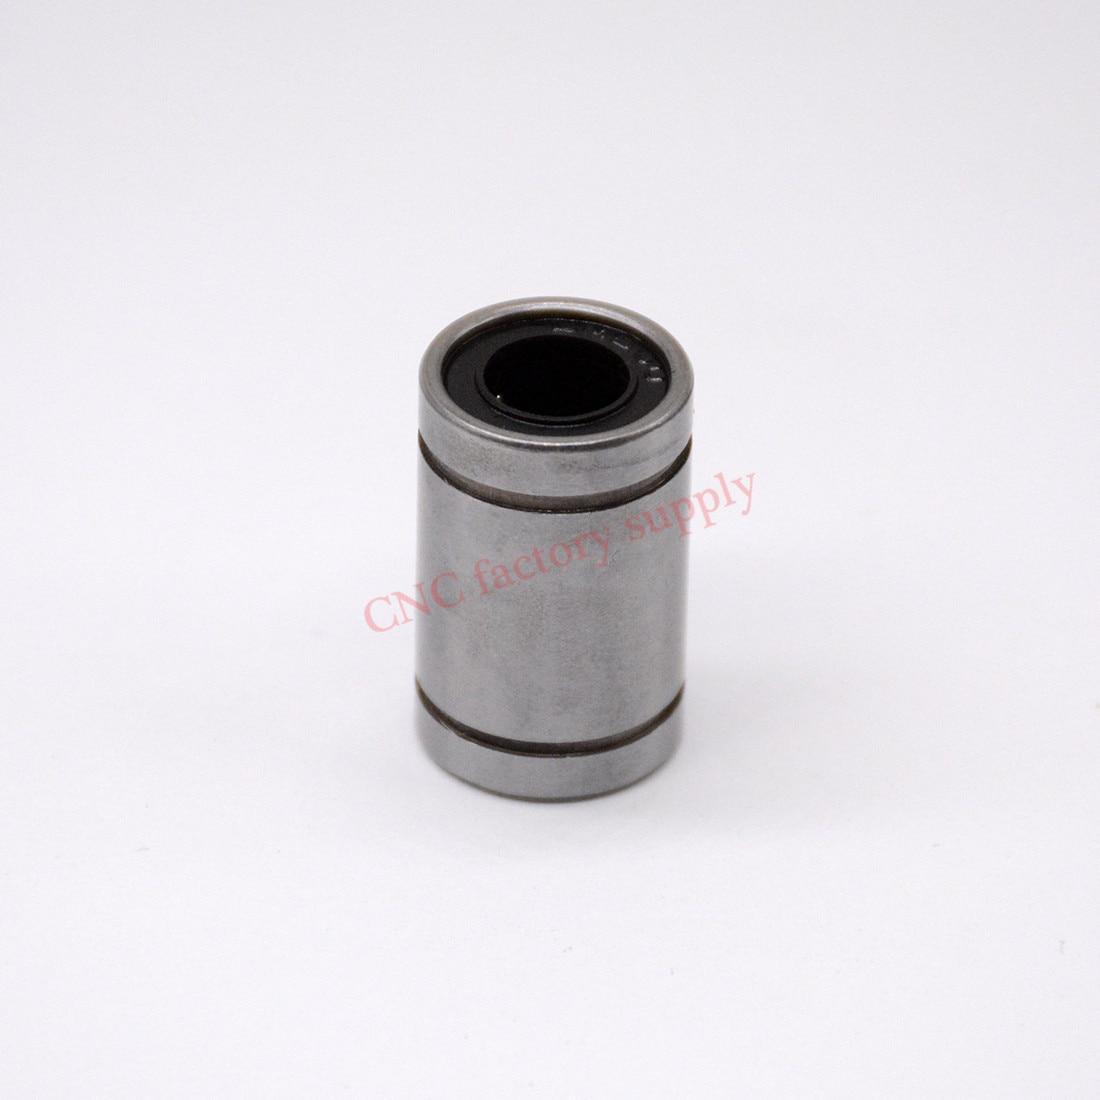 Hot sale  1pc LM16UU Linear Bushing  16mm CNC Linear Bearings hot sale 1pc lm12uu linear bushing 12mm cnc linear bearings